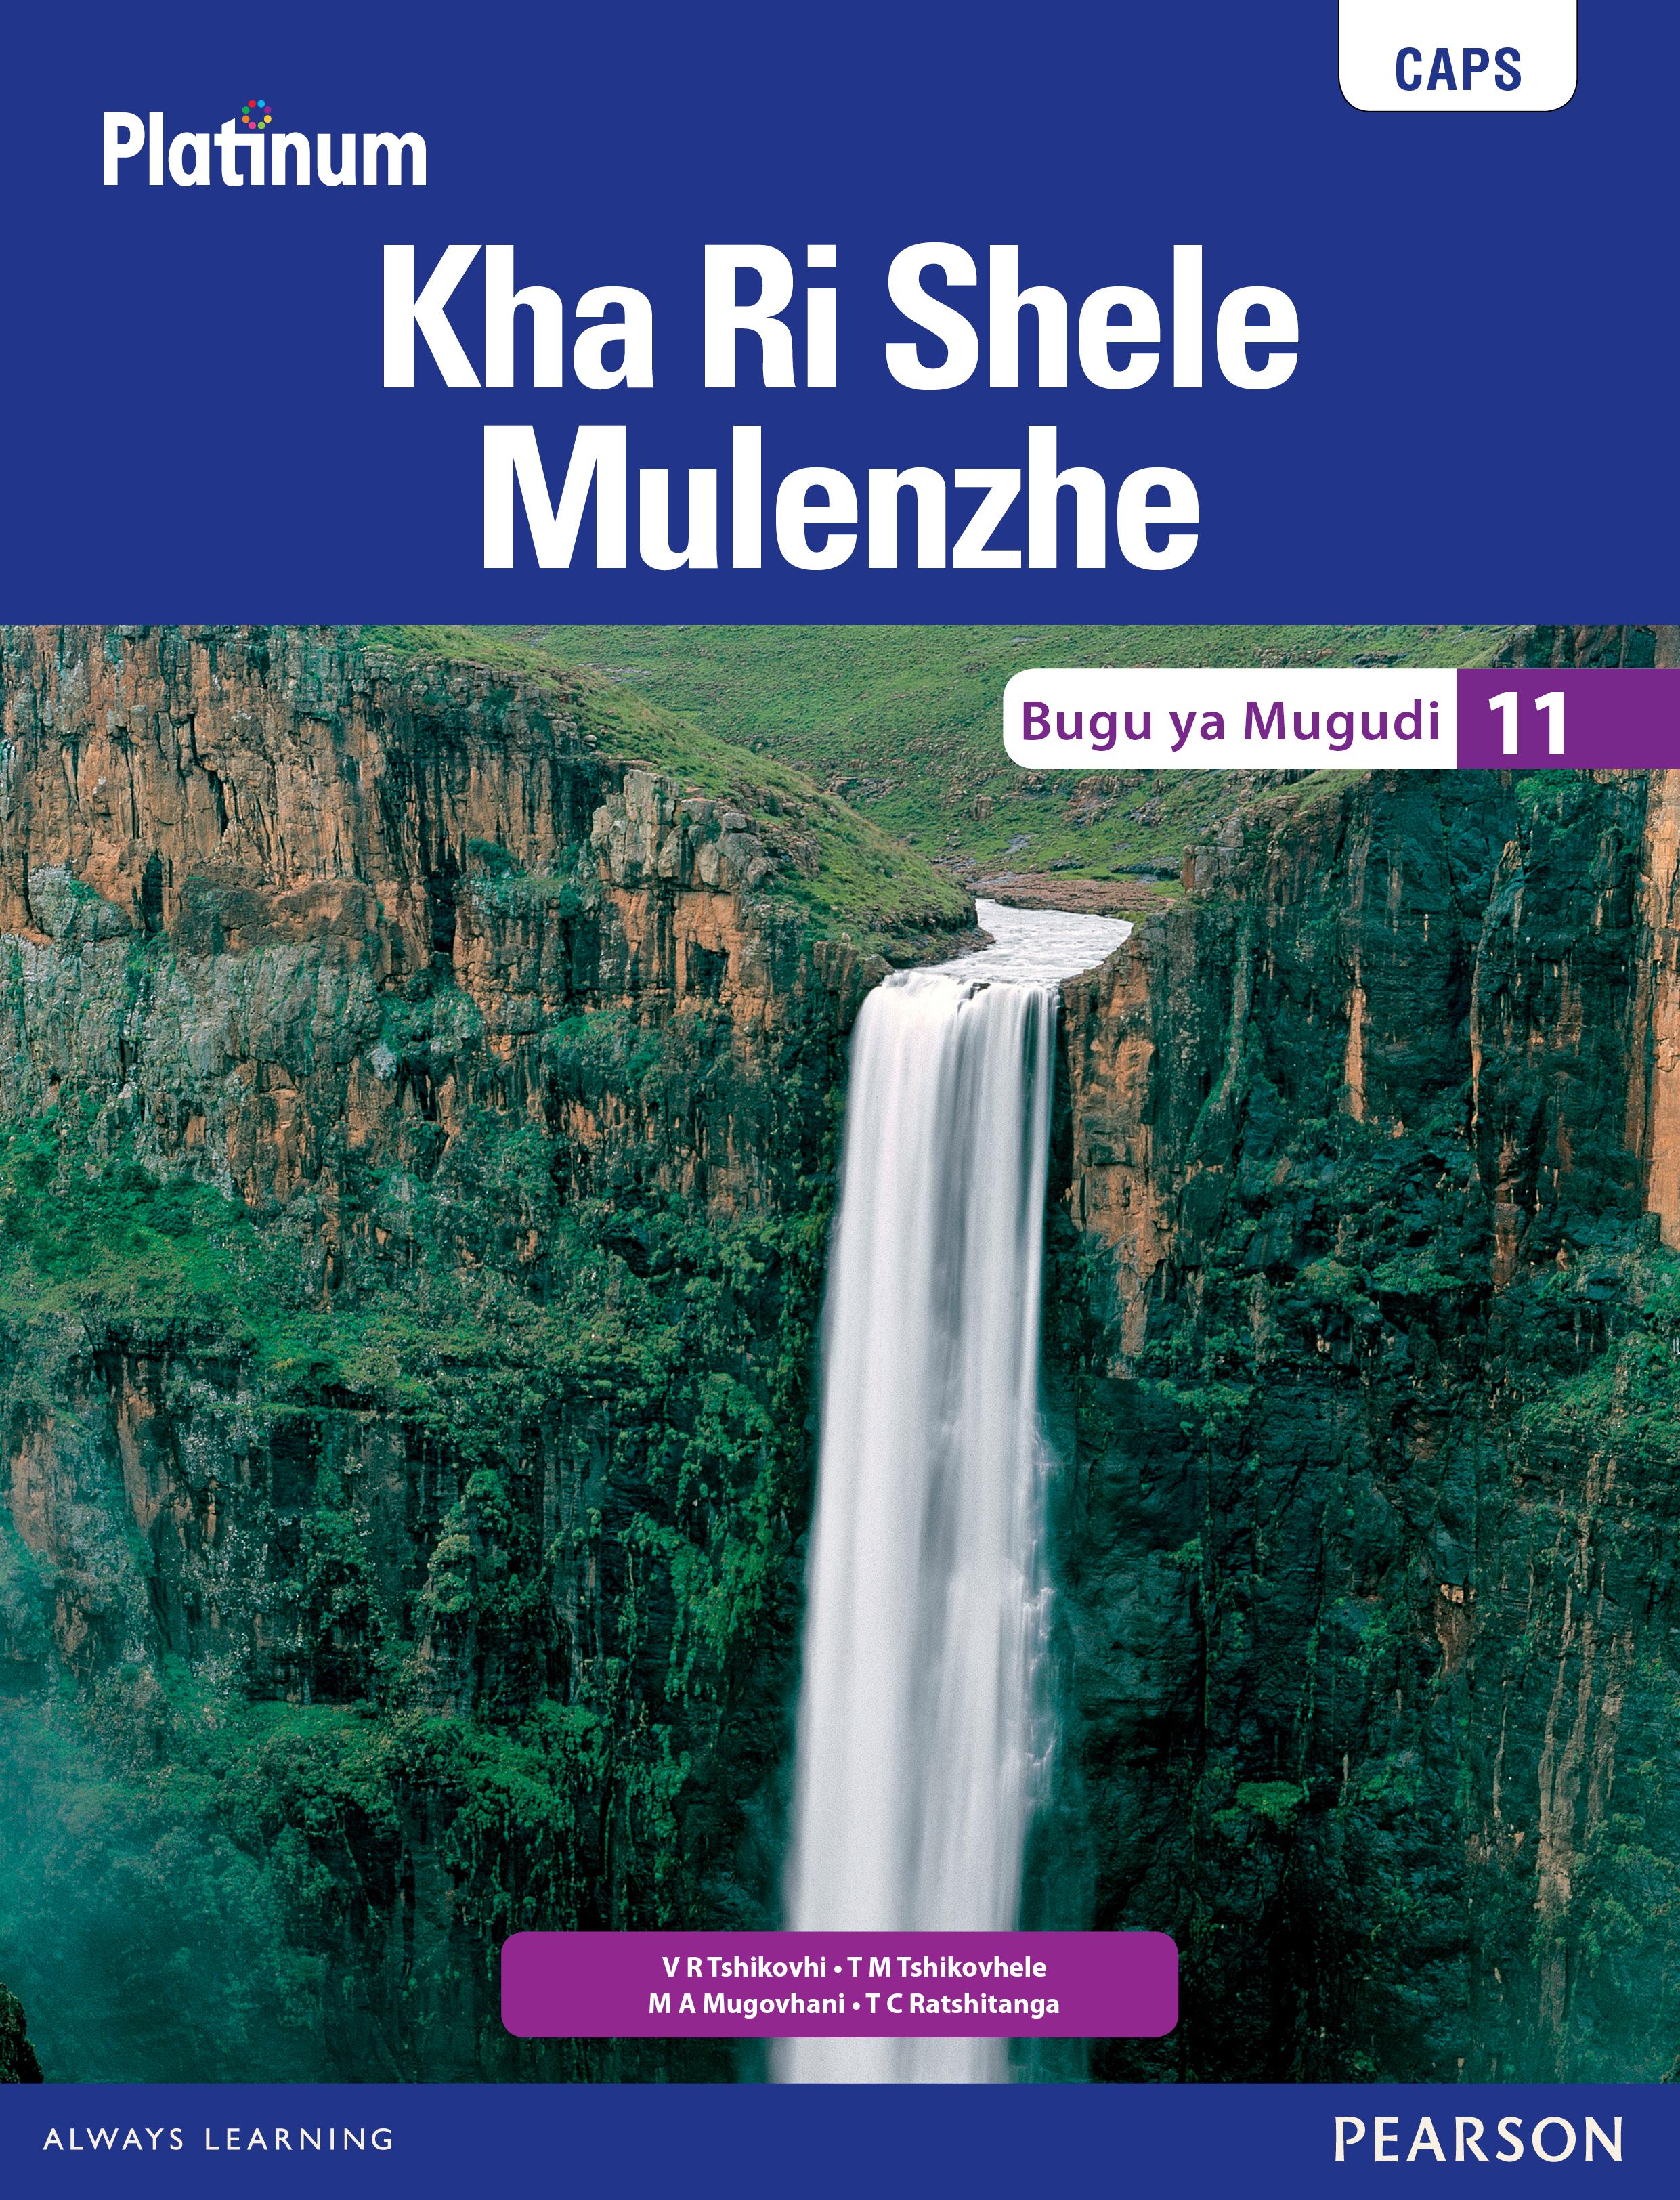 Picture of Platinum kha ri shele mulenzhe CAPS